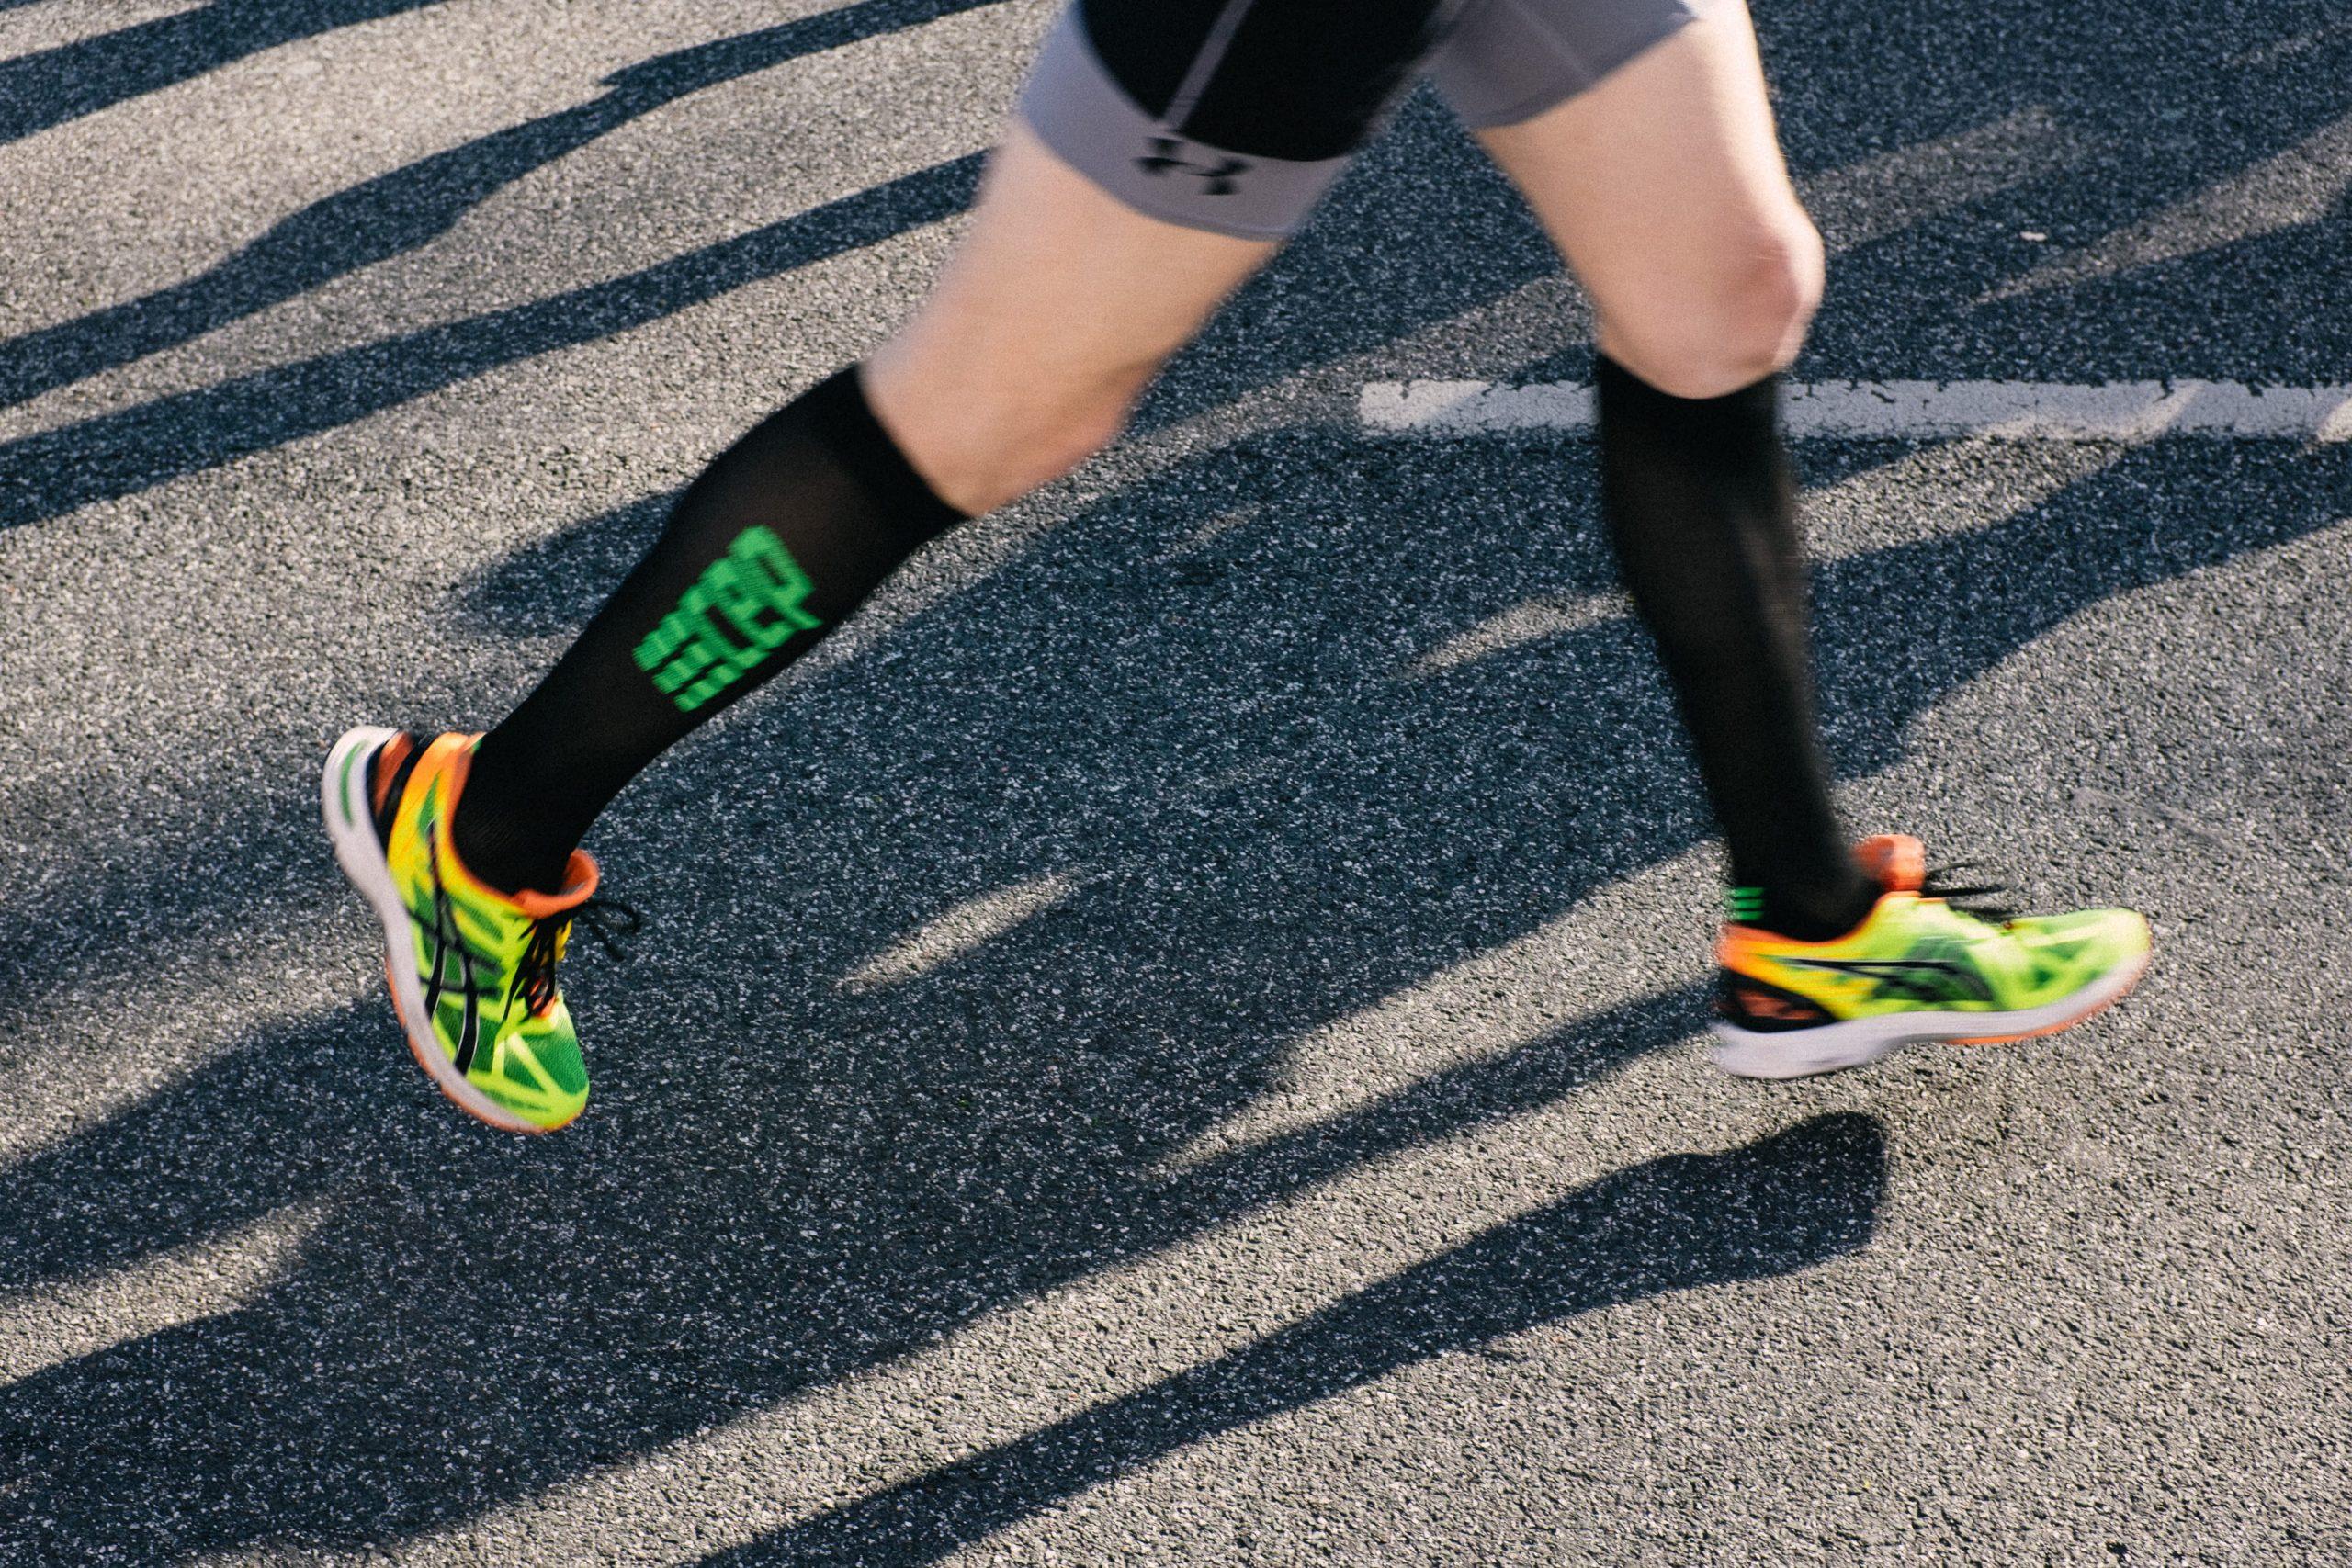 Marathon runner with compression socks